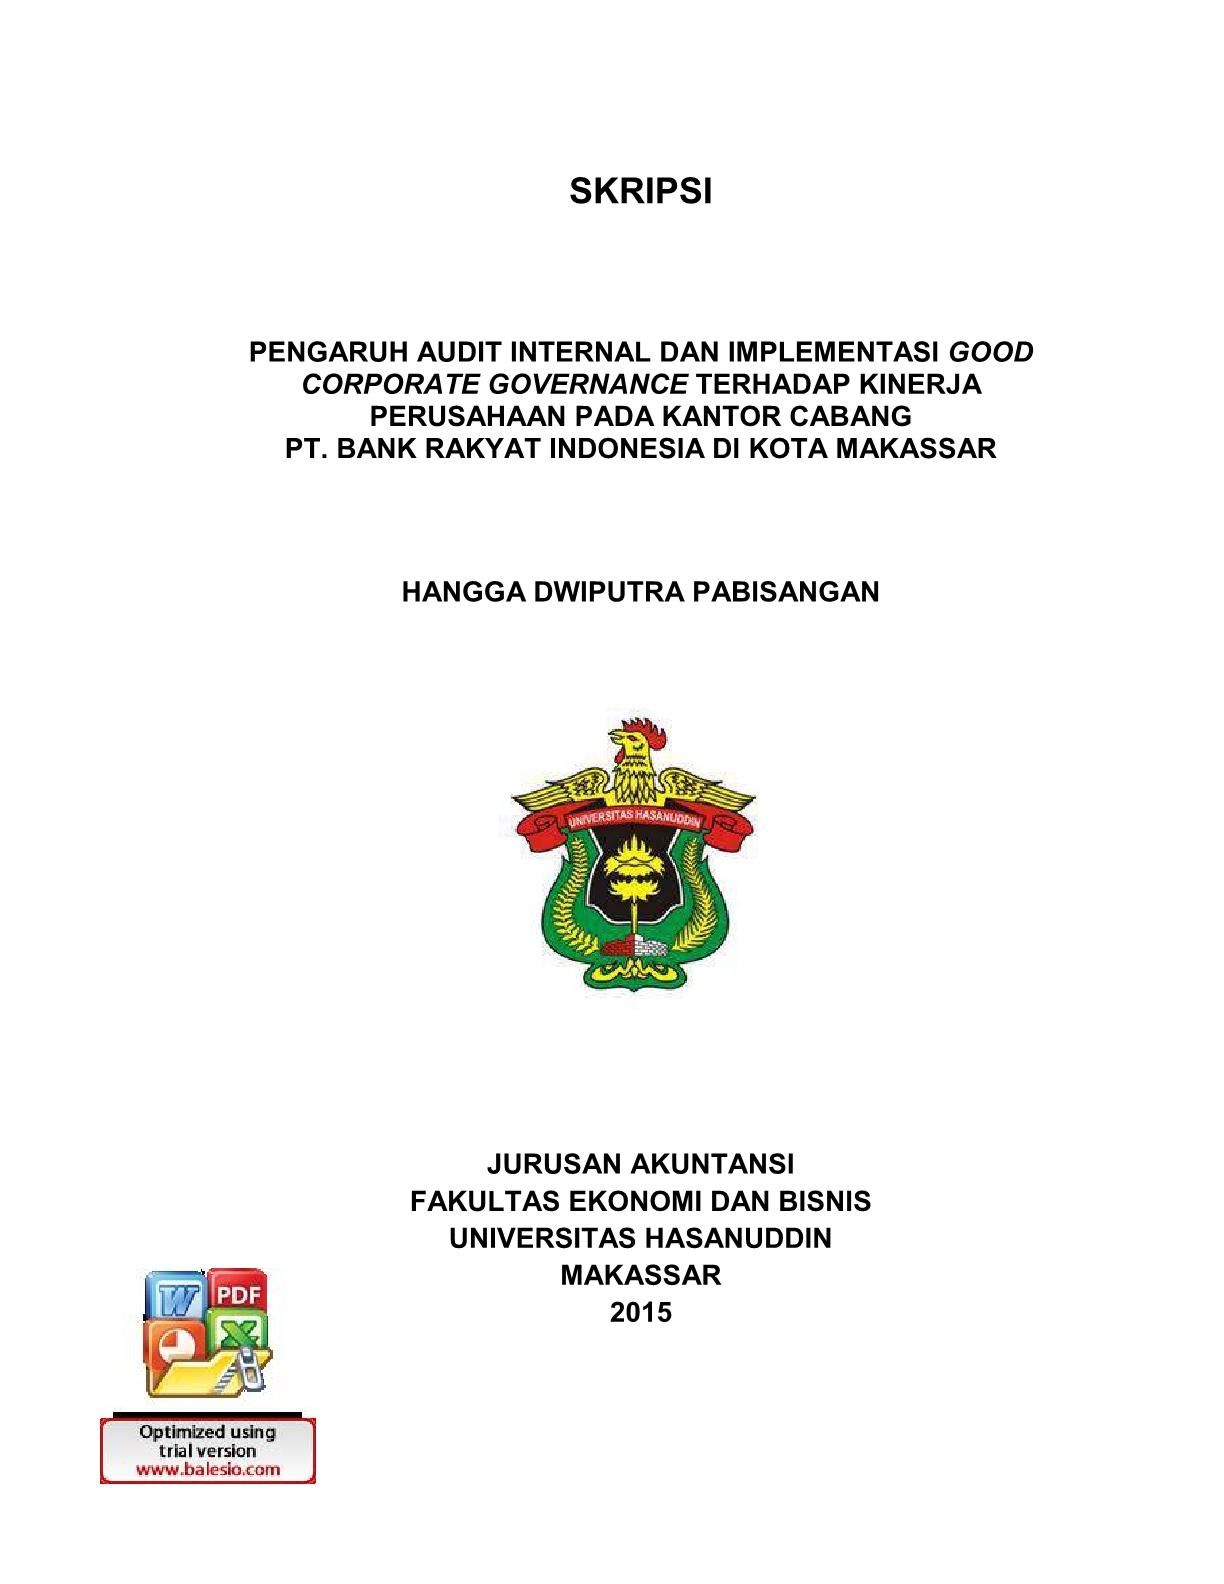 Pengaruh Audit Internal Dan Implementasi Good Corporate Governance Terhadap Kinerja Perusahaan Pada Kantor Cabang Pt Bank Rakyat Indonesia Di Kota Makassar Hangga Dwiputra Pabisangan Perpustakaan Universitas Hasanuddin